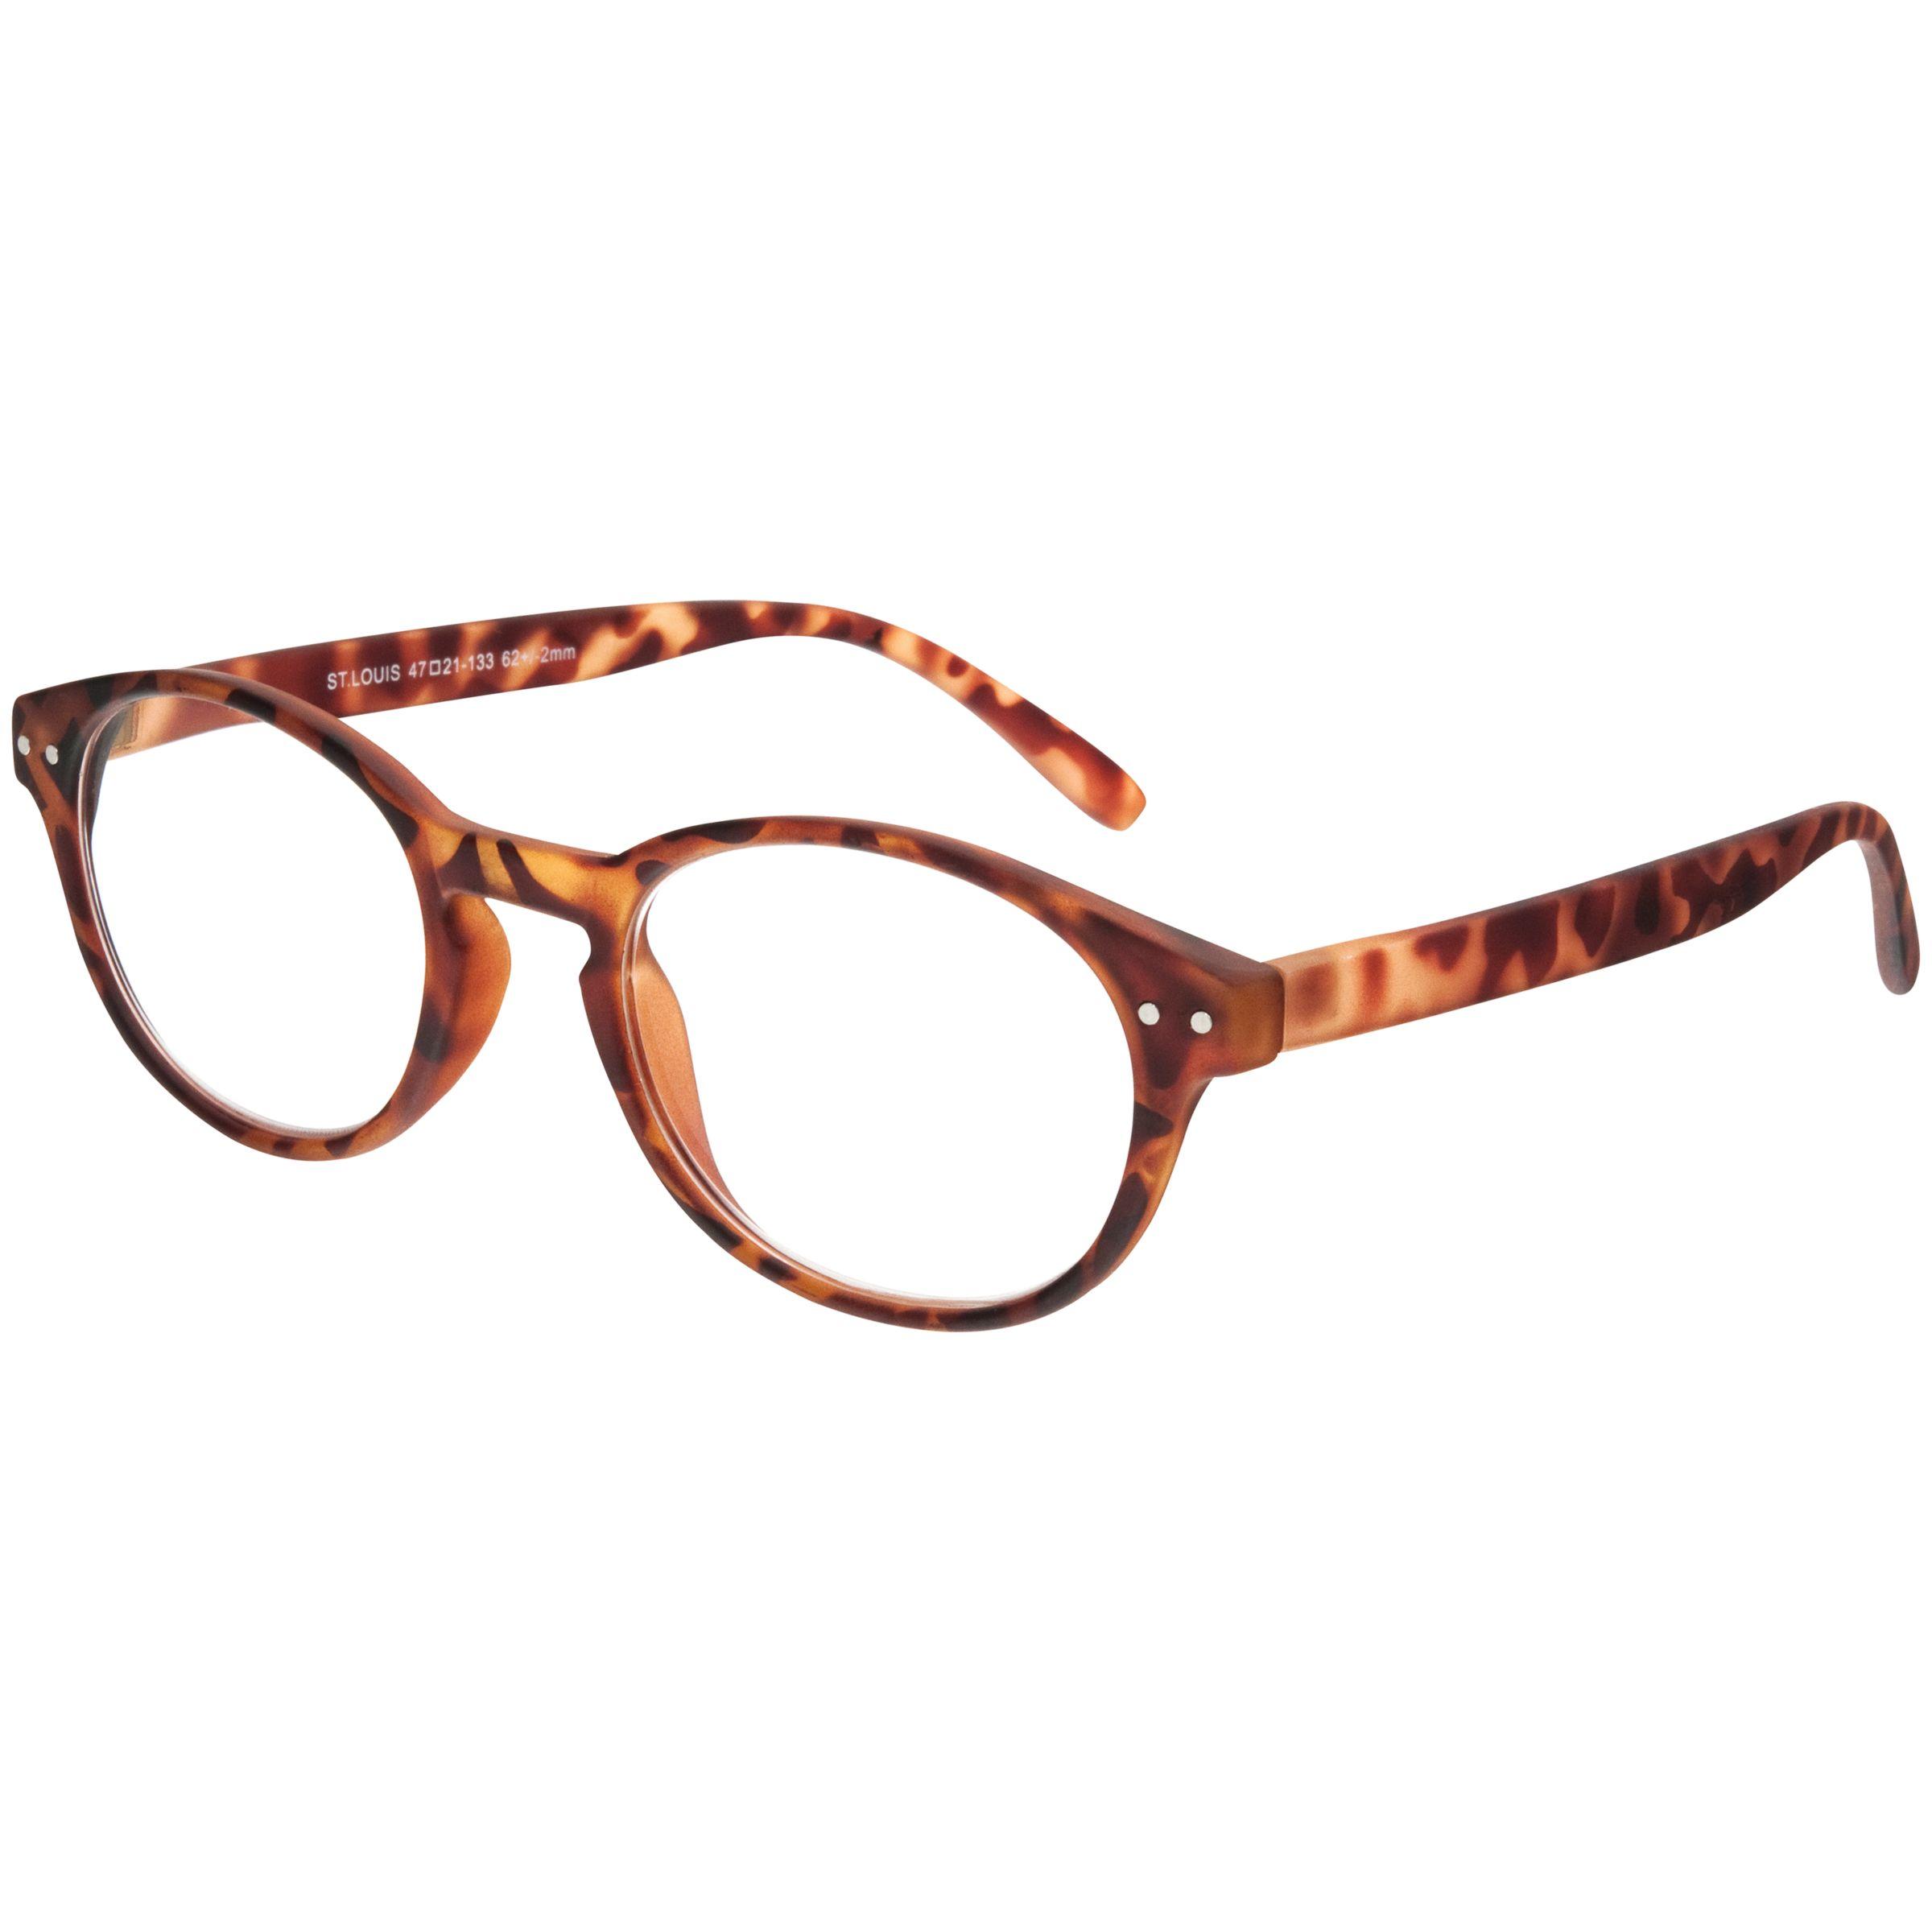 Magnif Eyes Magnif Eyes Ready Readers St Louis Glasses, Tortoise